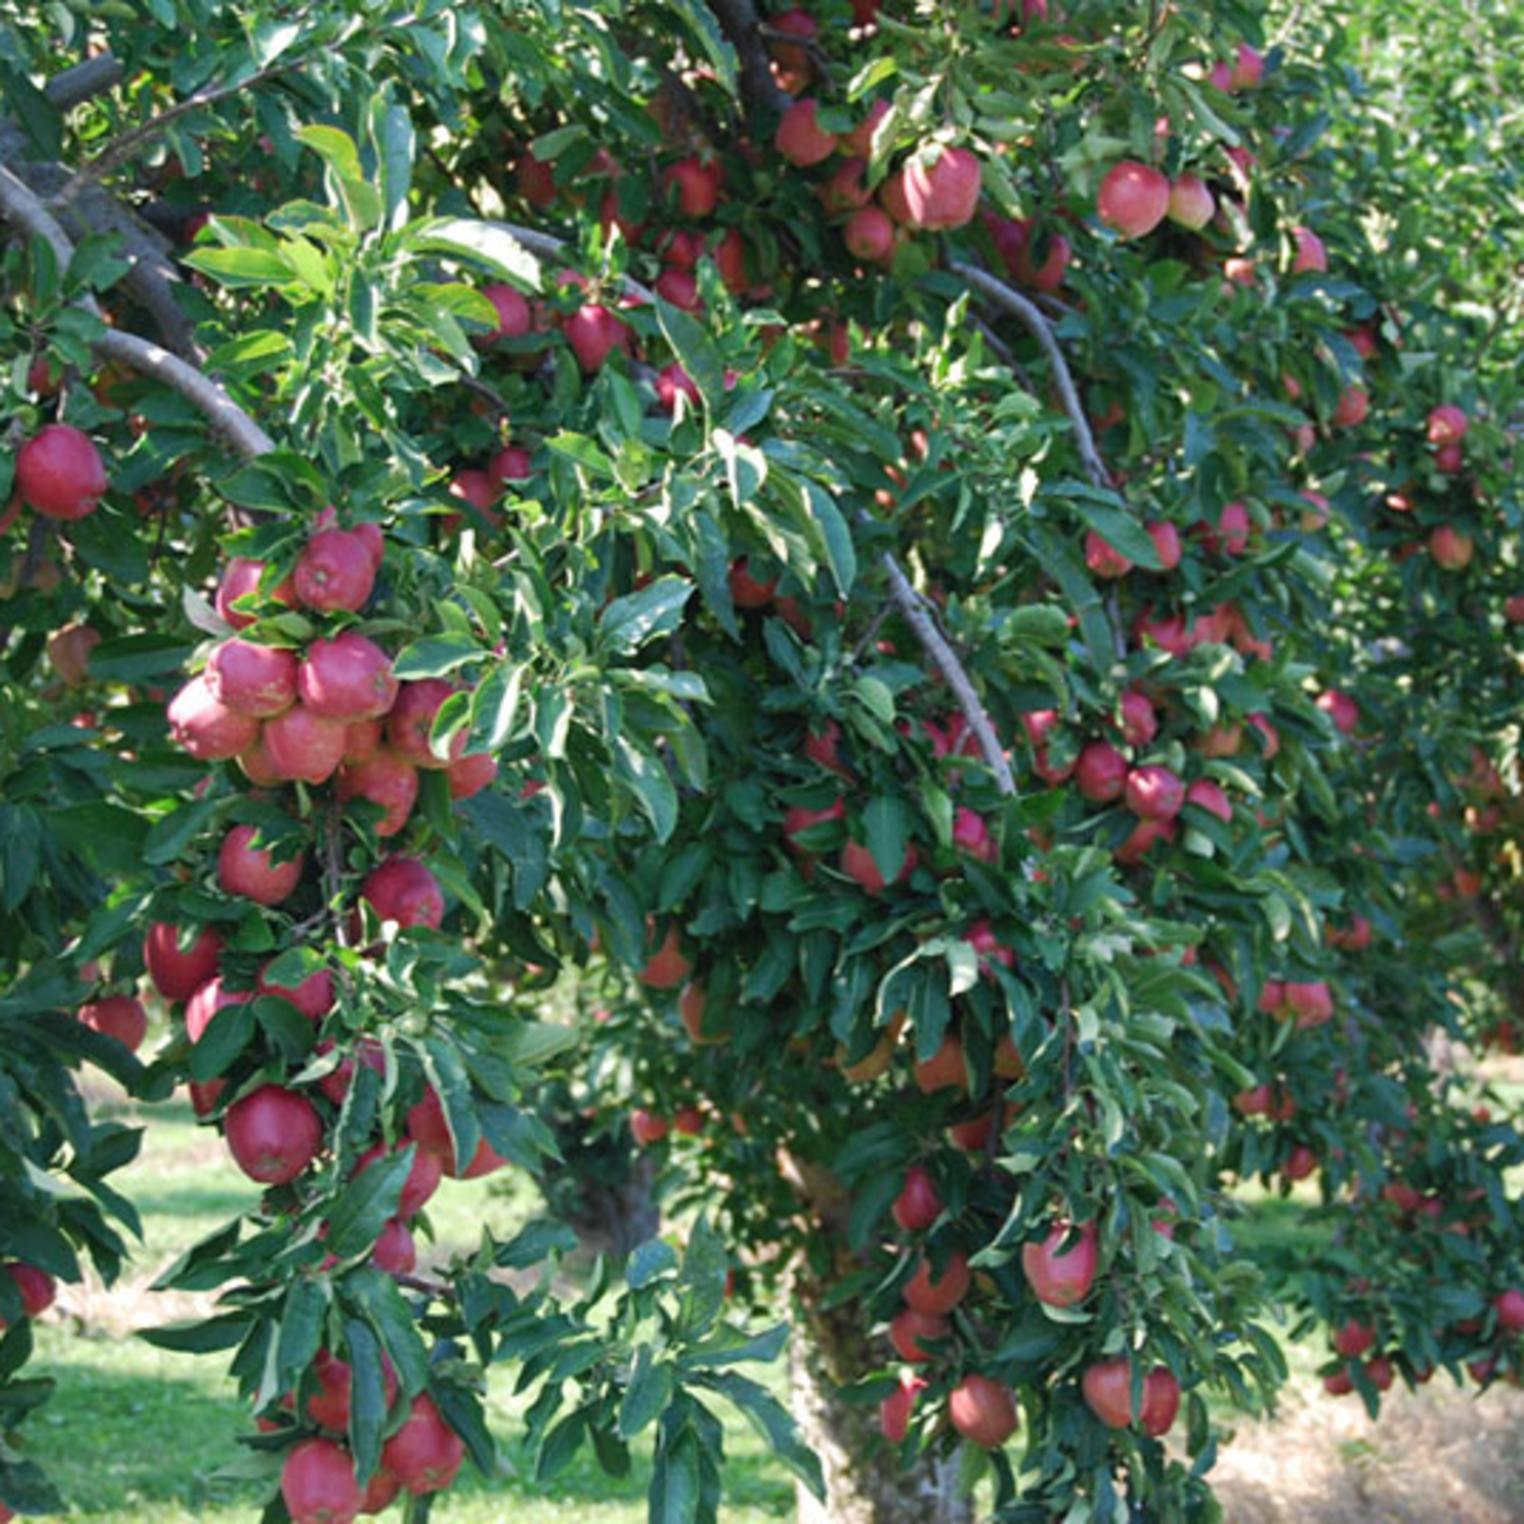 Apple Trees at Toigo Orchards